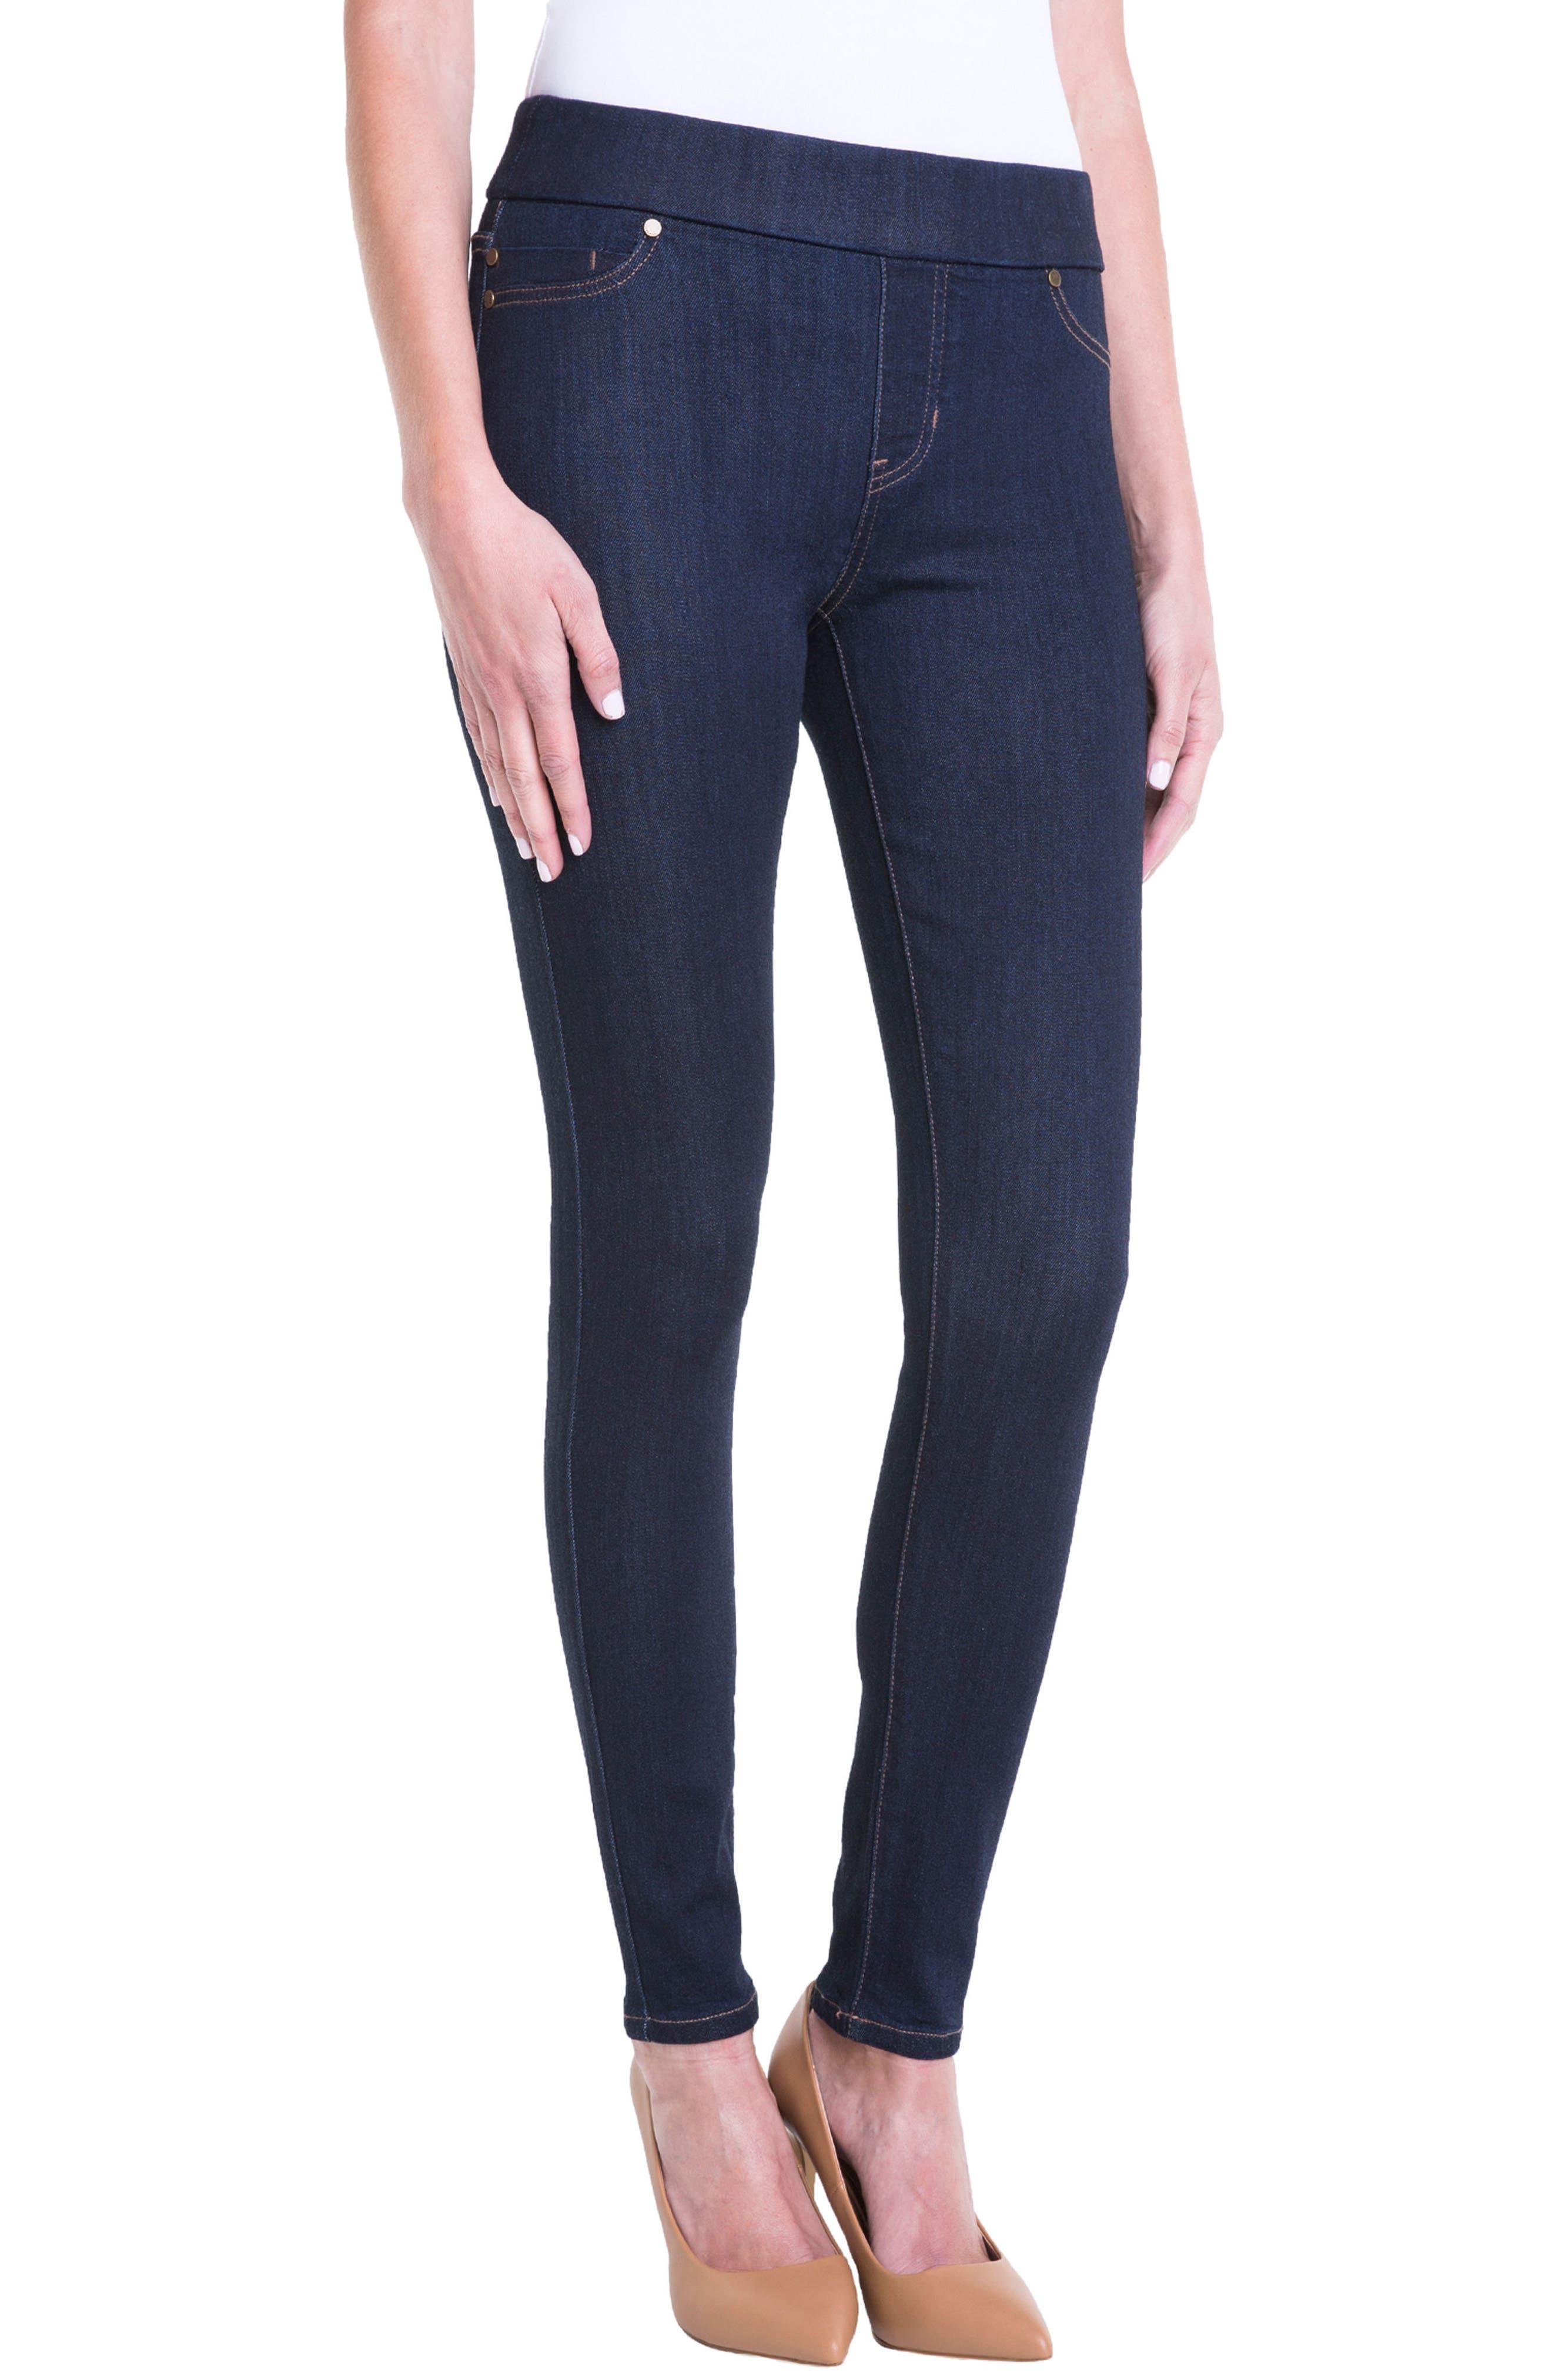 Jeans Company Sienna Mid Rise Soft Stretch Denim Leggings,                             Alternate thumbnail 3, color,                             Indigo Rinse